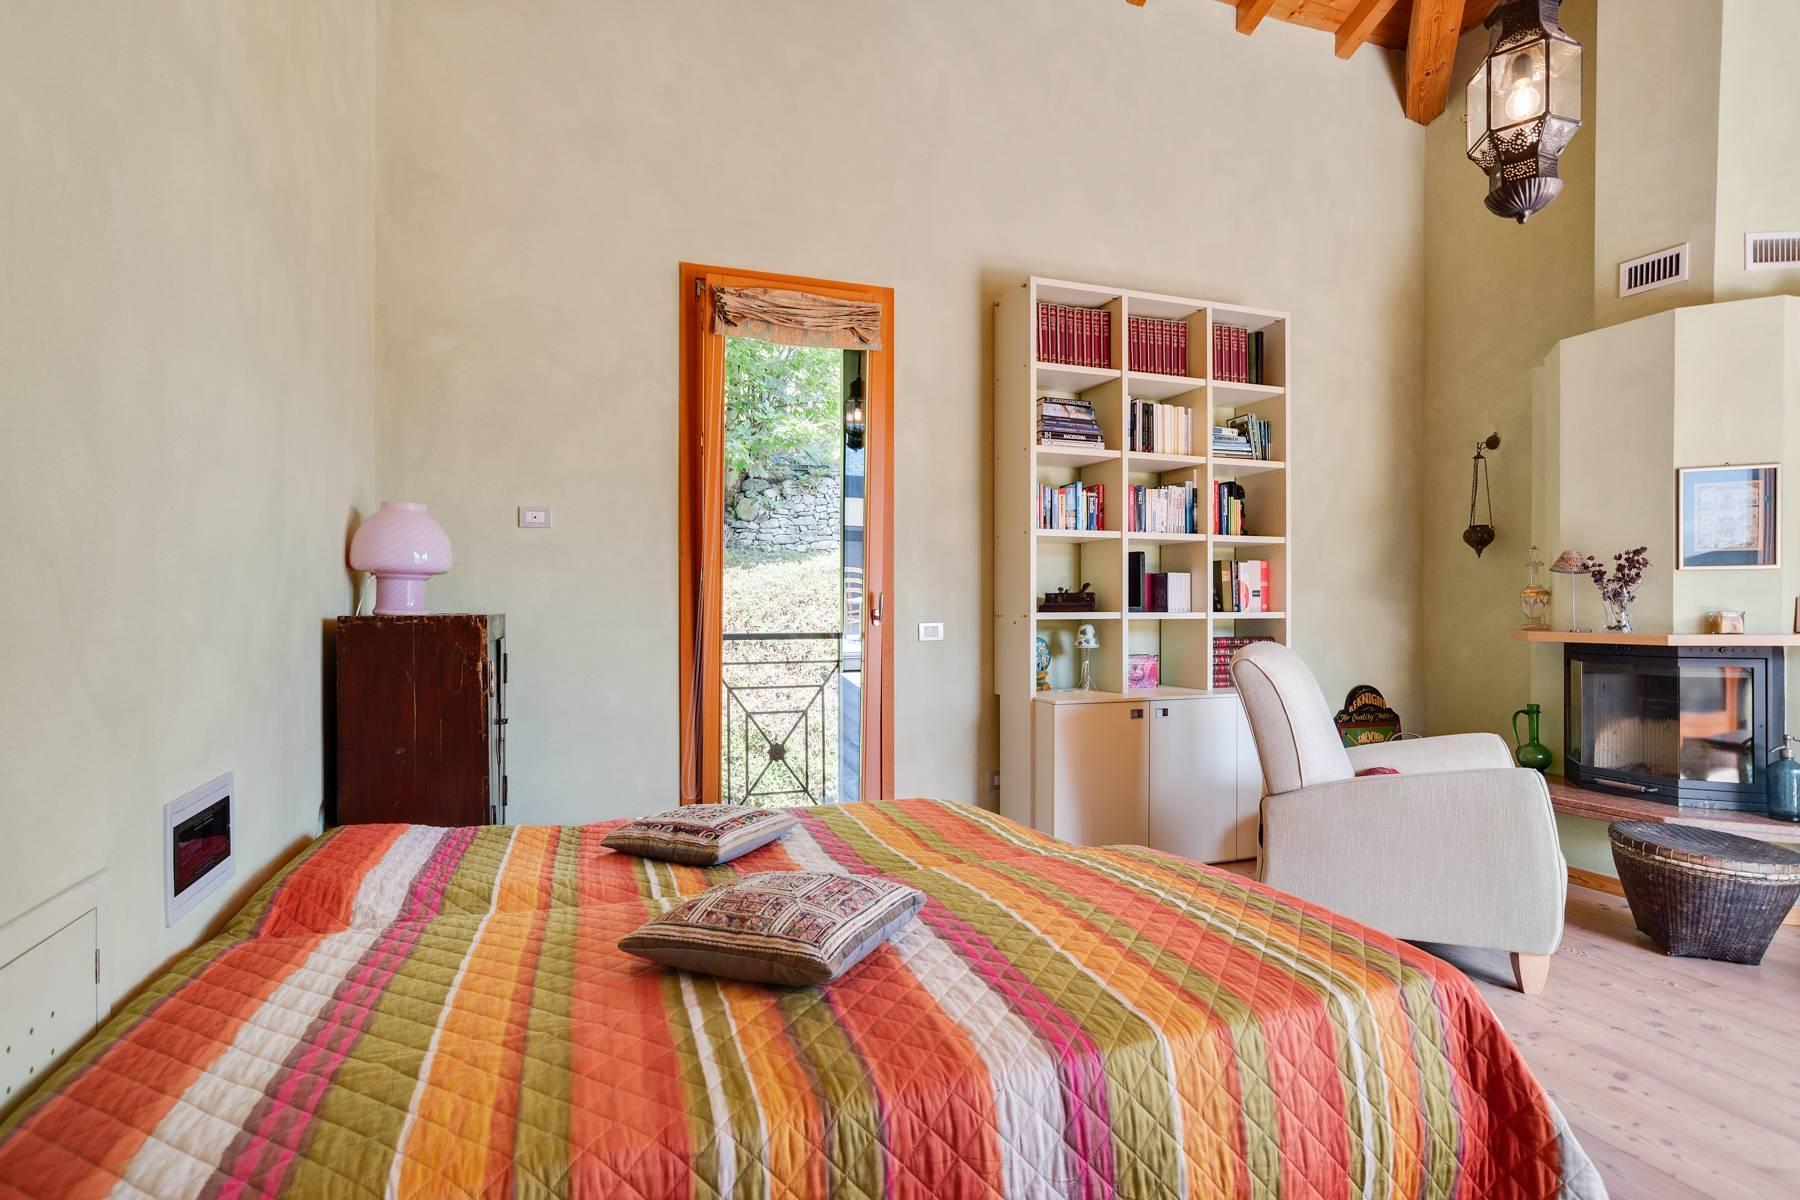 Splendida villa moderna sulla collina soleggiata sopra Argegno - 29